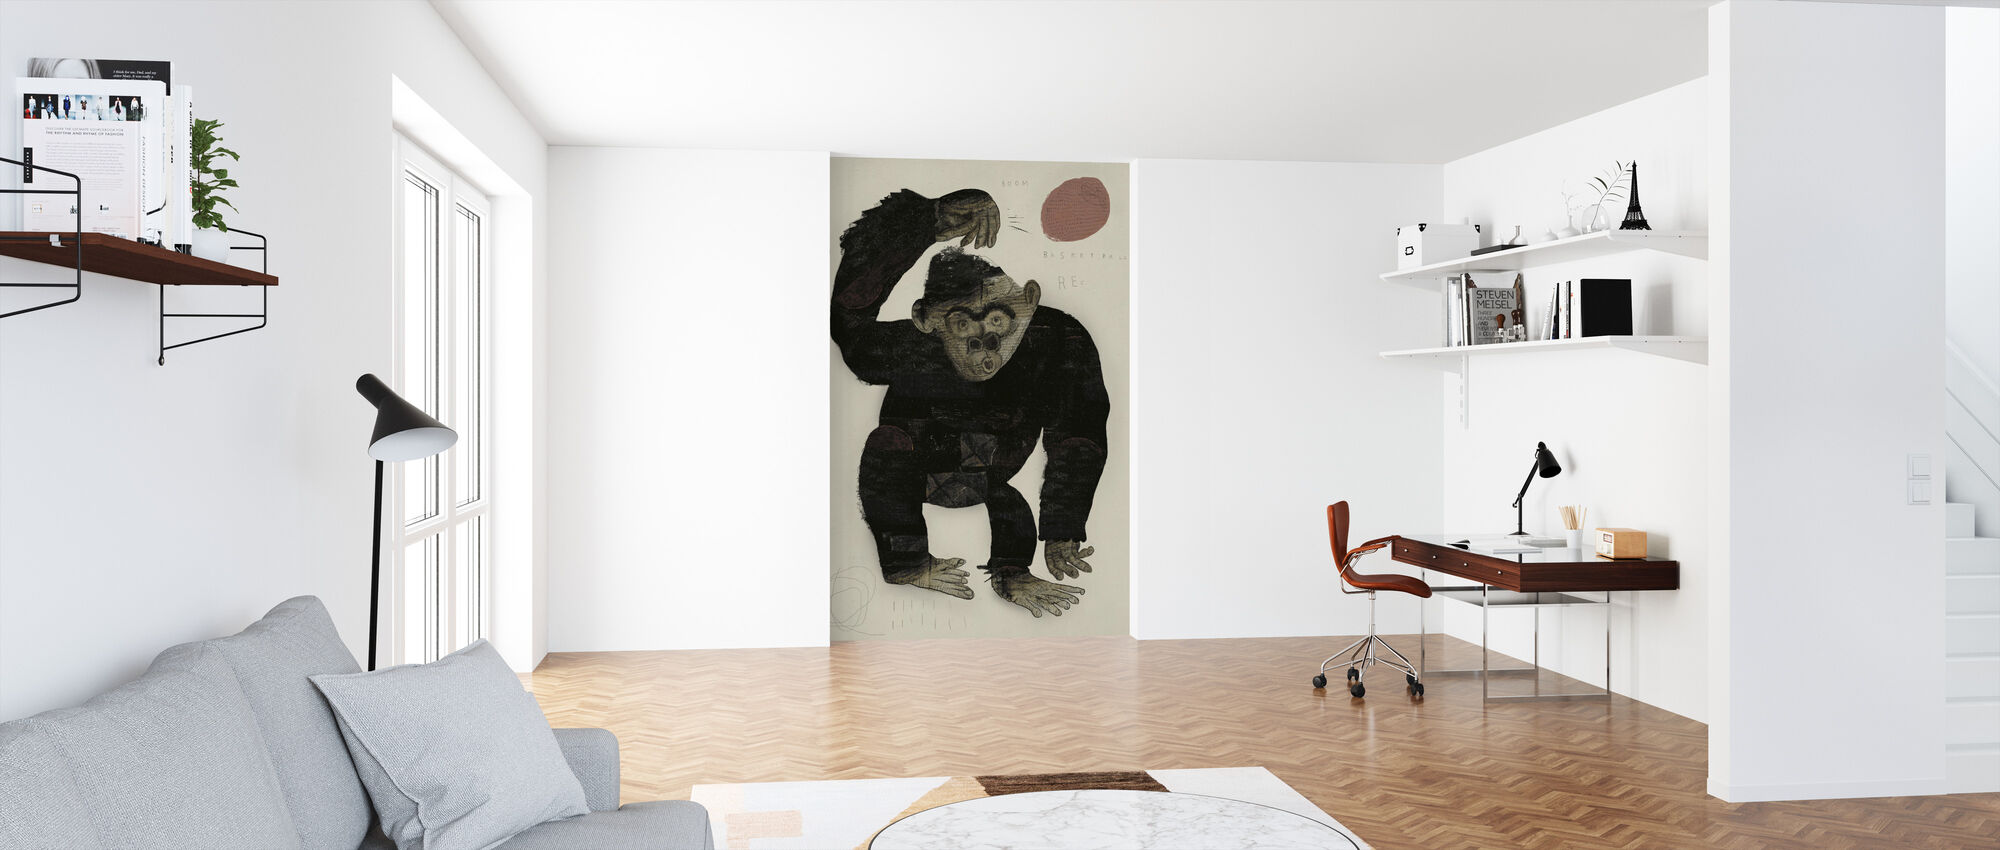 Monkey Basketball - Wallpaper - Office